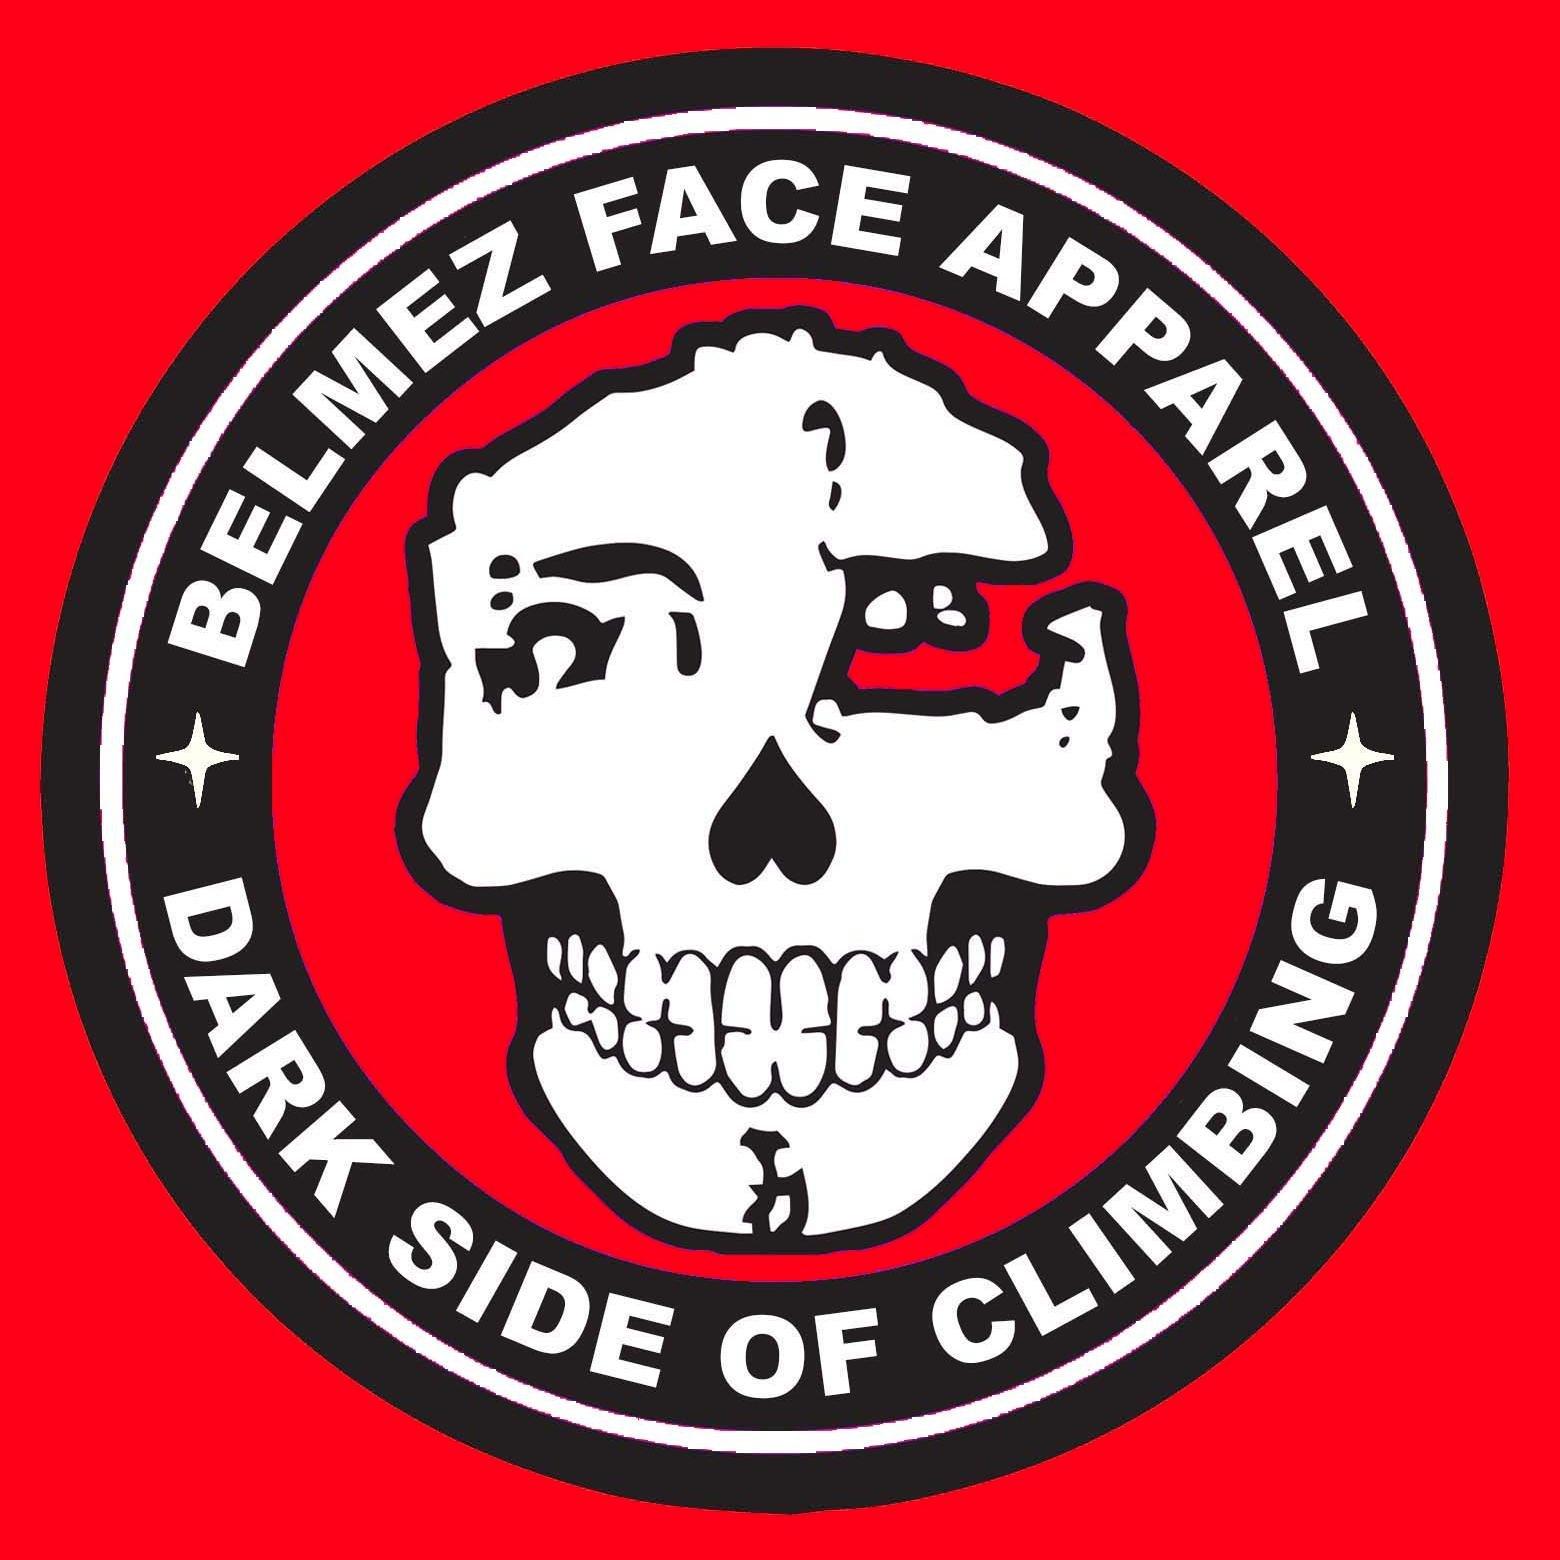 Sponsors: BelmezFace